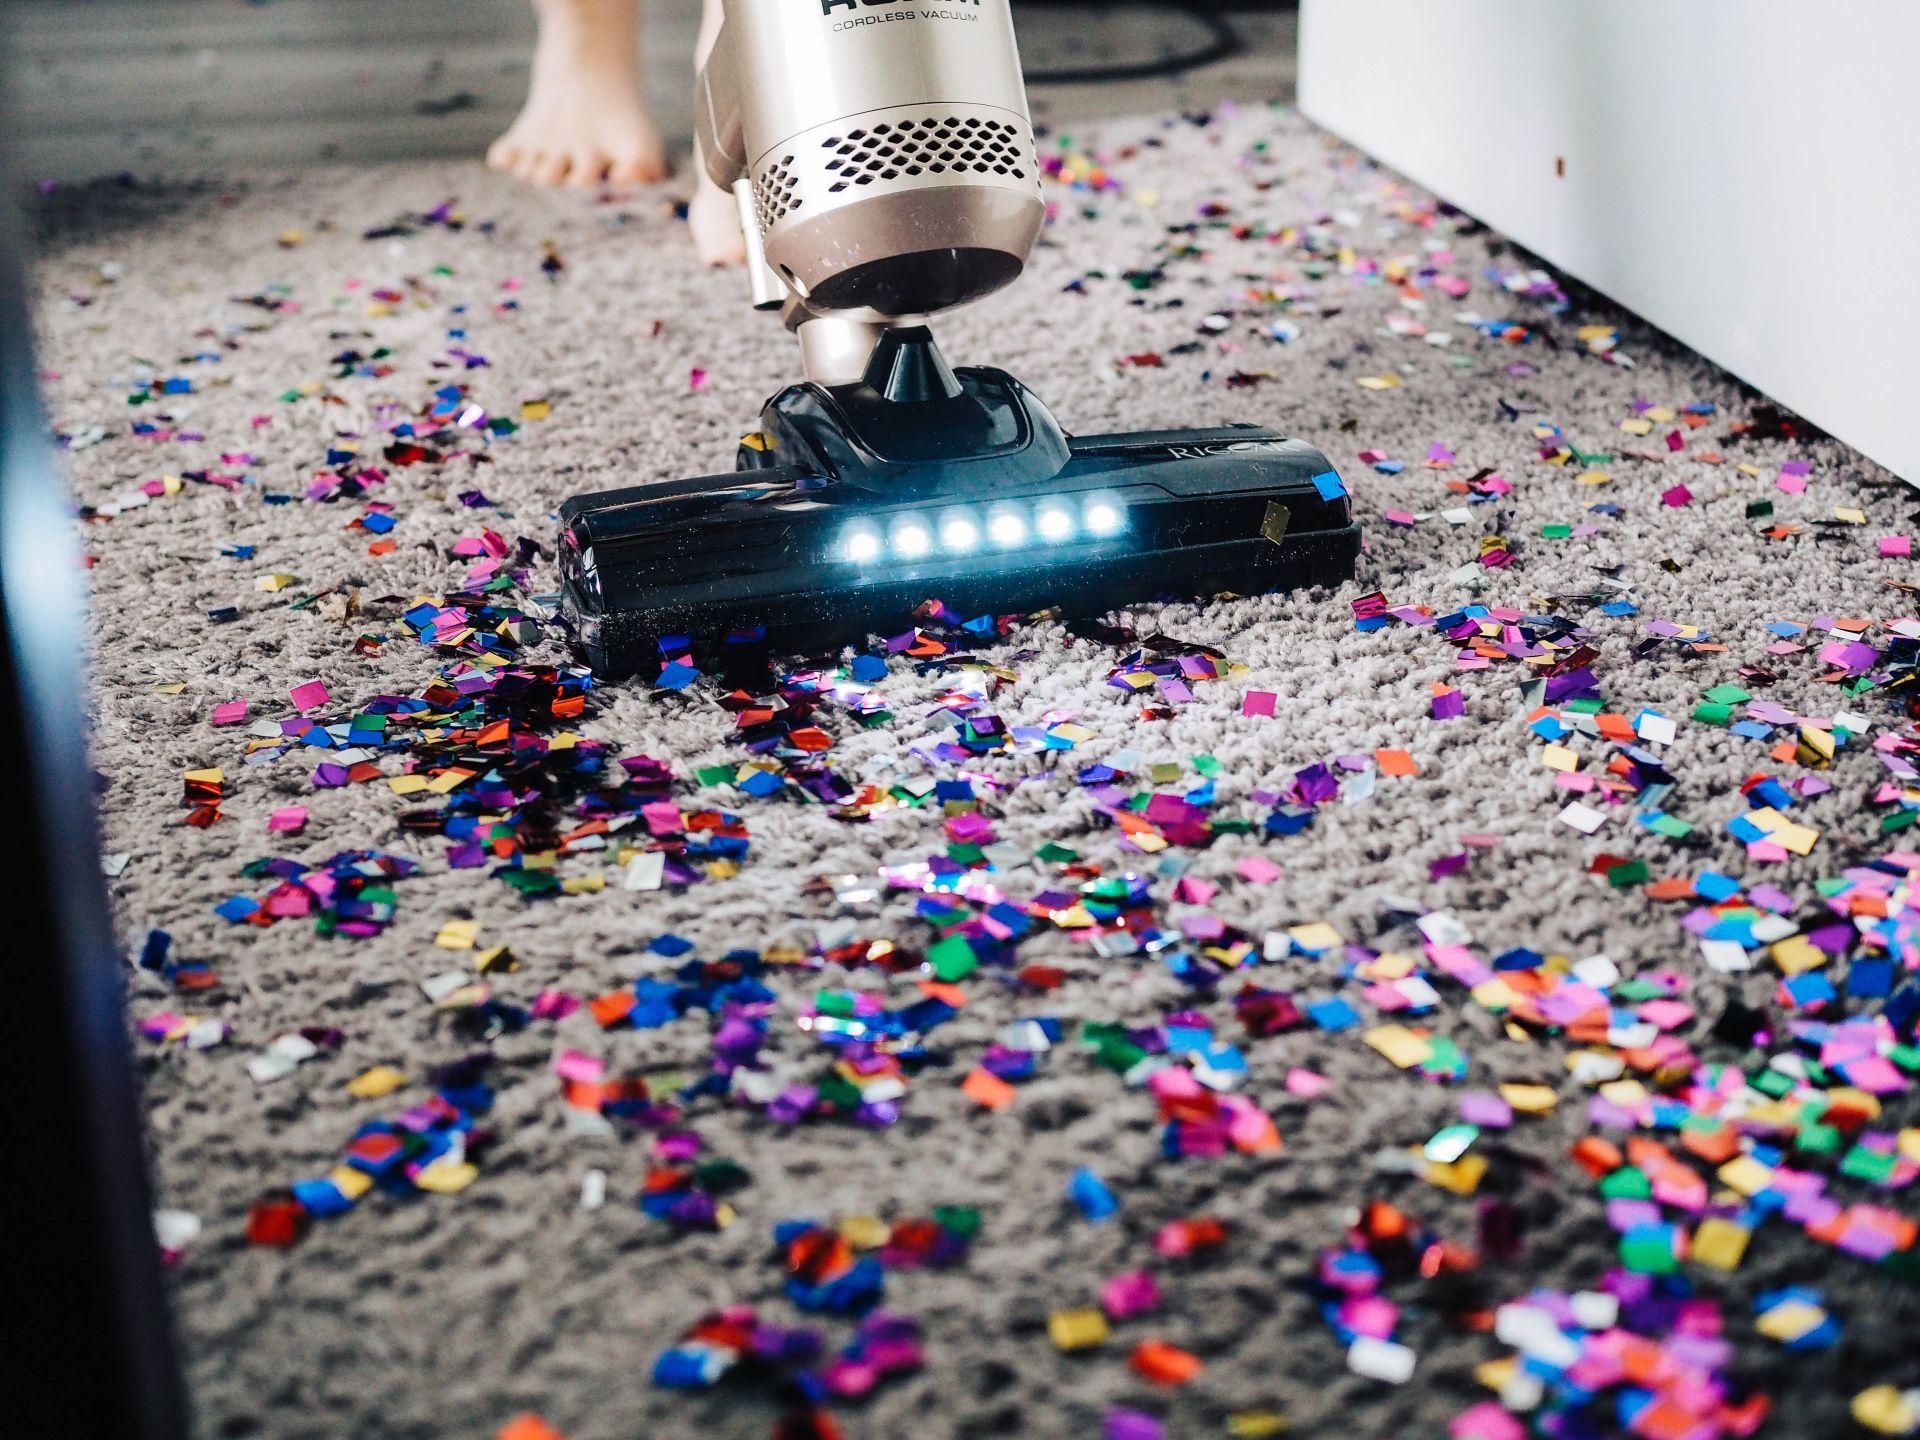 Hot Household Debate: Robot Vacuums v. Traditional Vacuums